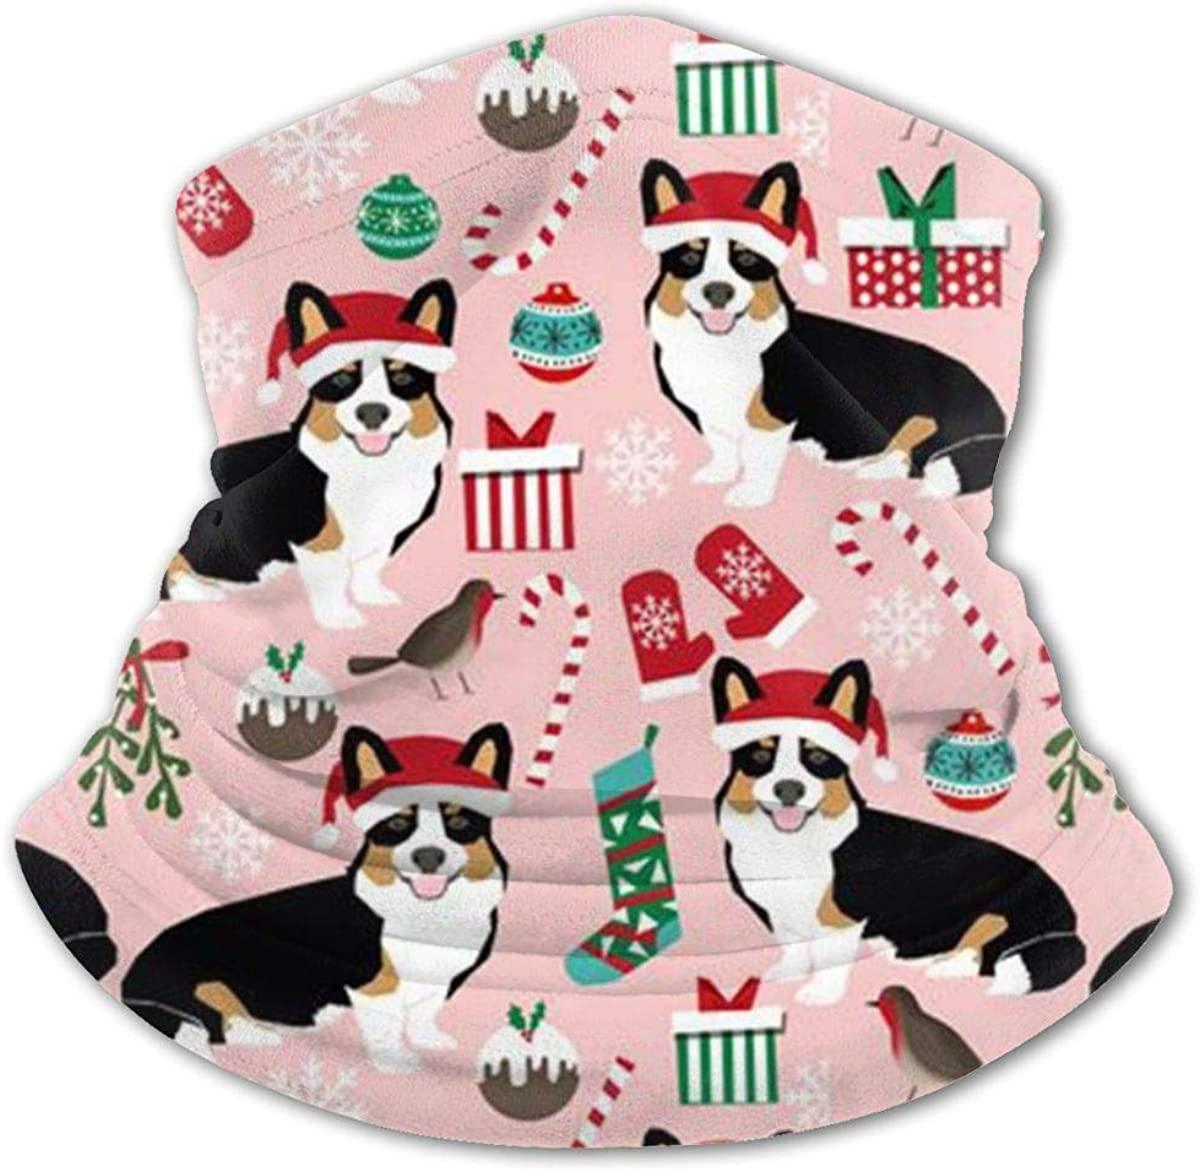 Pet Friendly - Corgi Christmas Headwear For Girls And Boys, Head Wrap, Neck Gaiter, Headband, Tenn Fishing Mask, Magic Scarf, Tube Mask, Face Bandana Mask For Camping Running Cycling